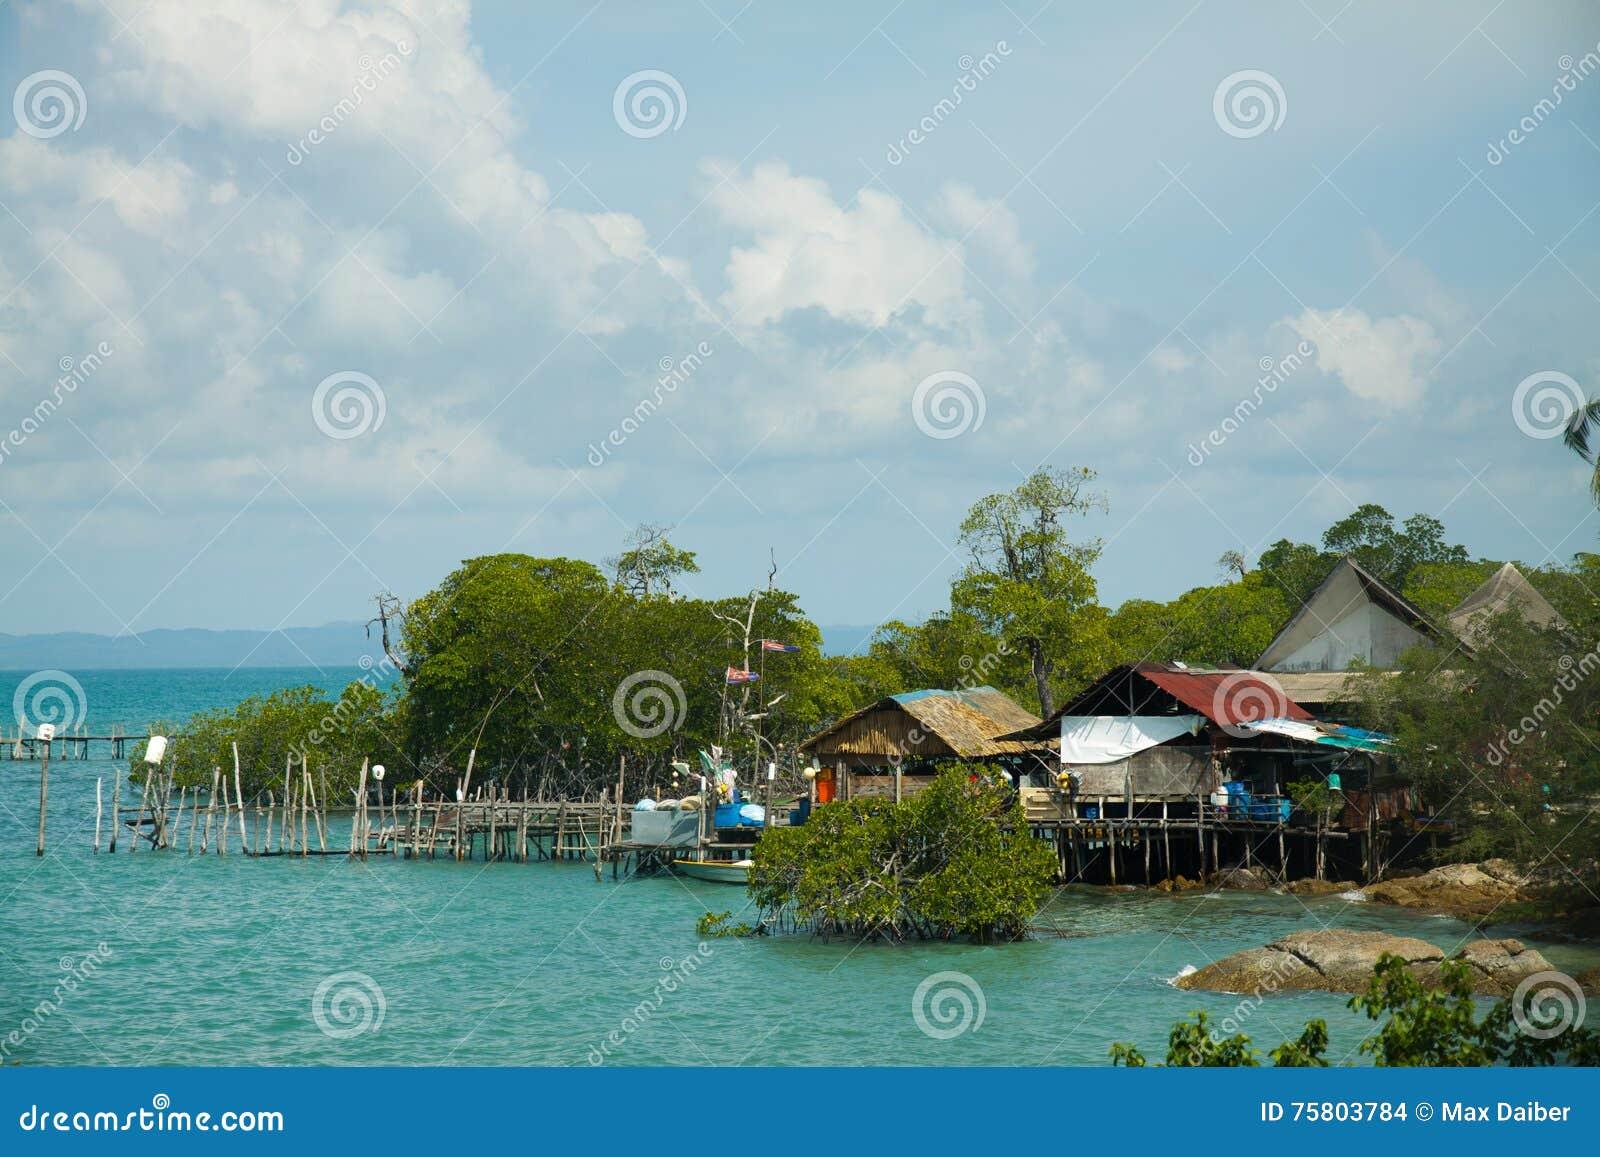 Wooden houses on piles pulau Sibu, Malaysia